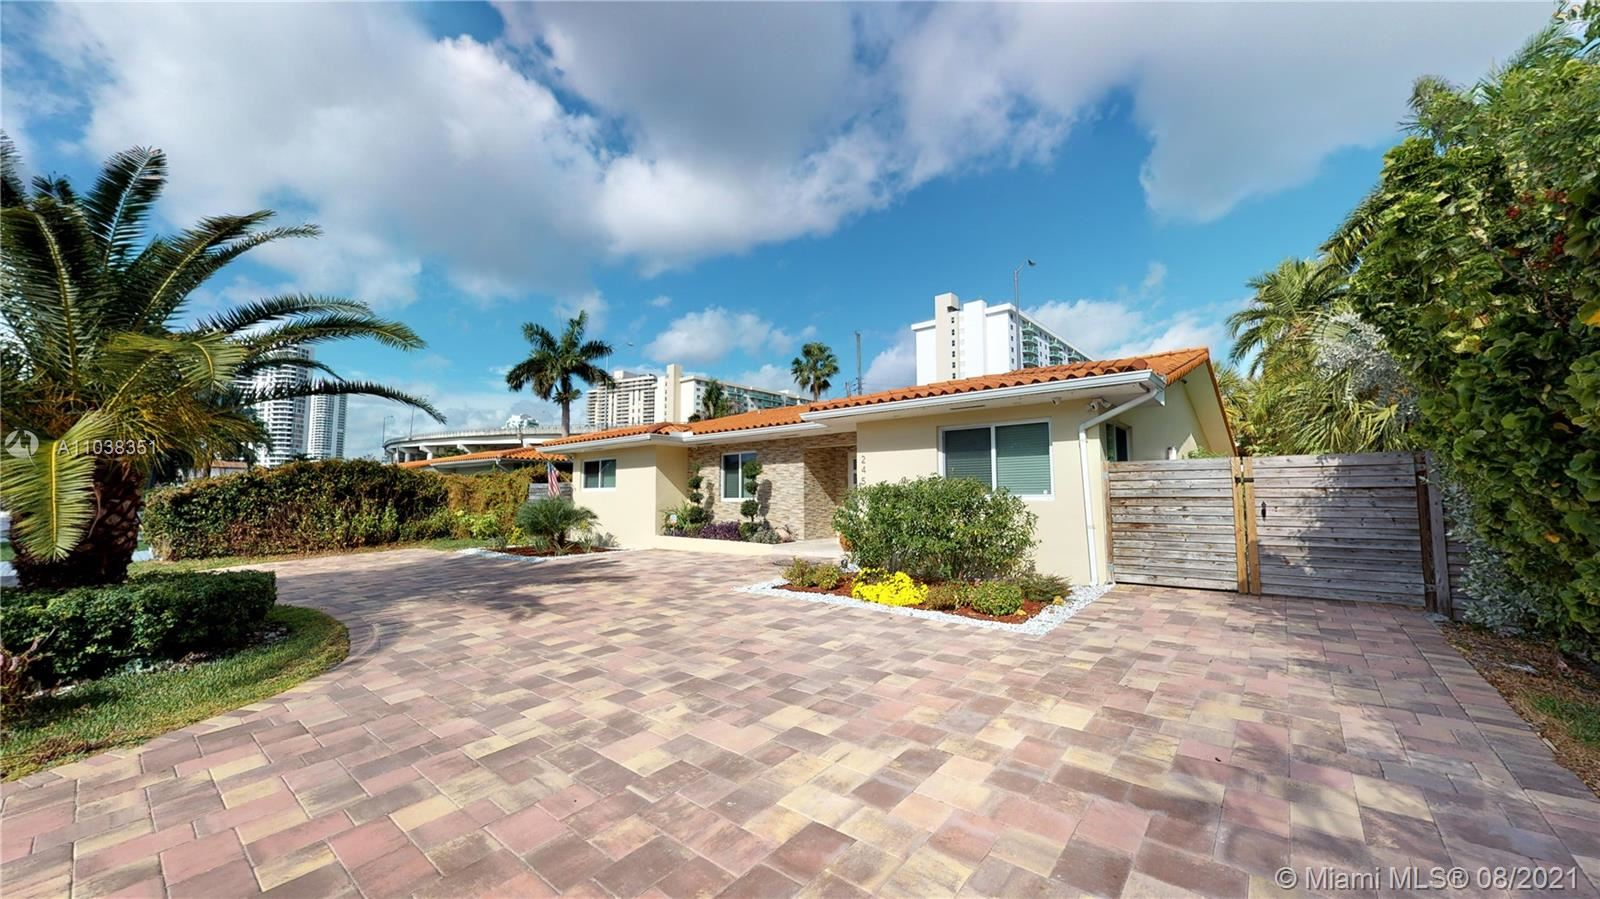 245 191st Ter, Sunny Isles, FL 33160 - #: A11038351